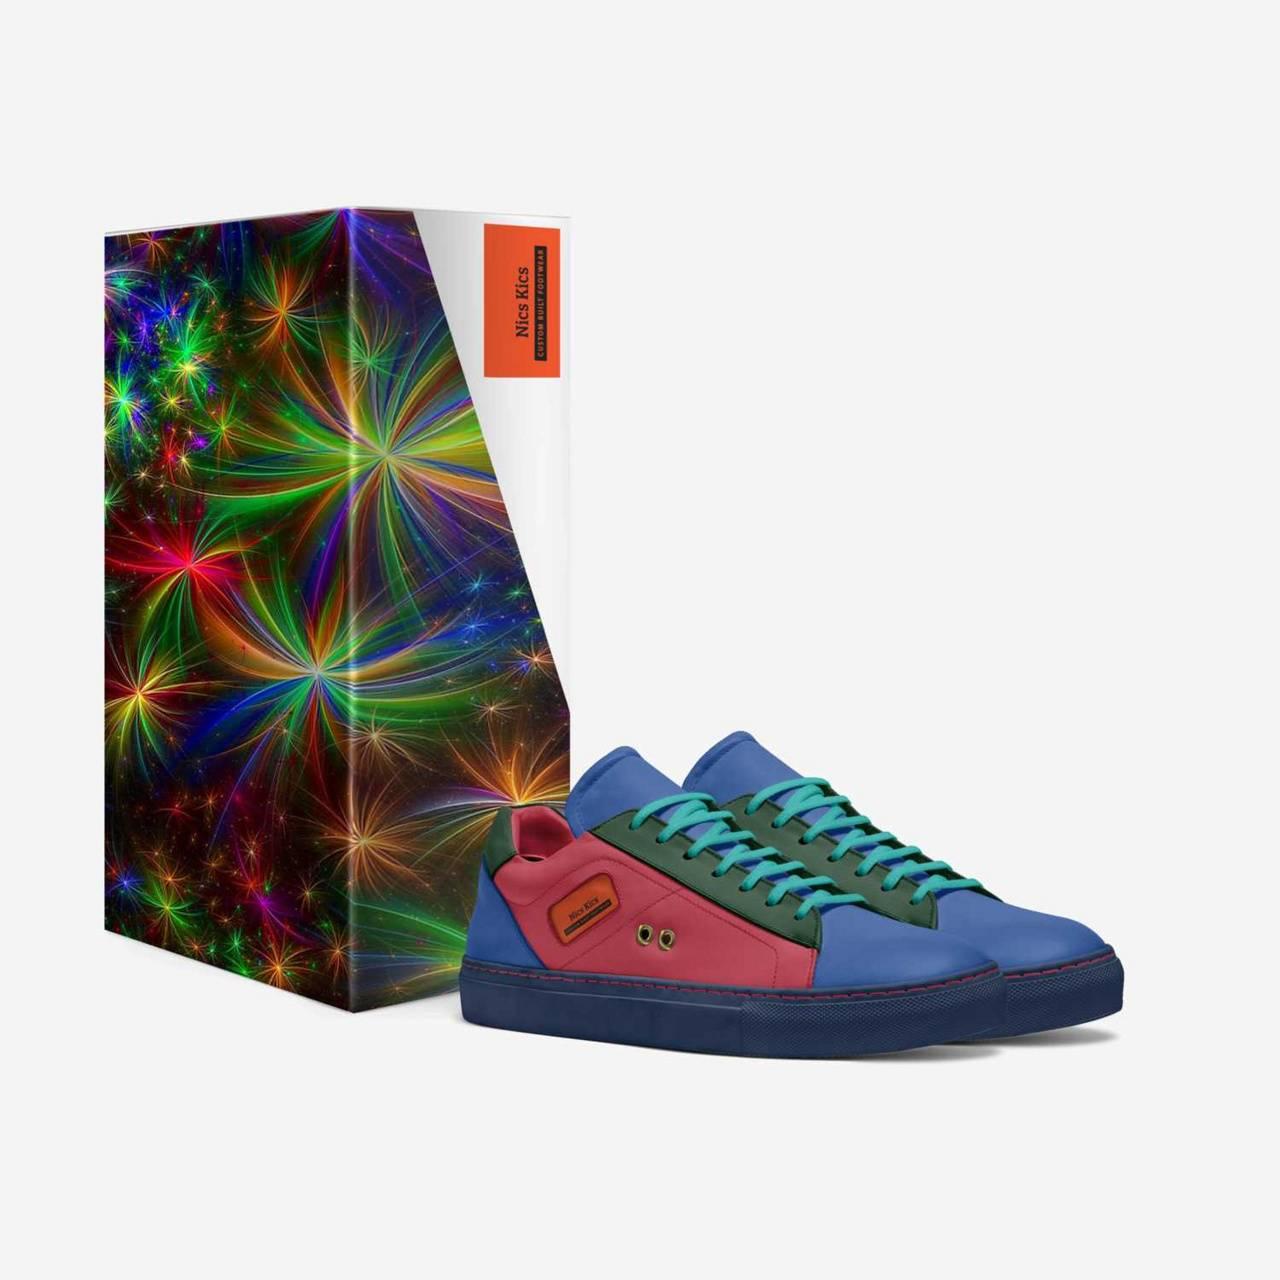 nicks cool shoes